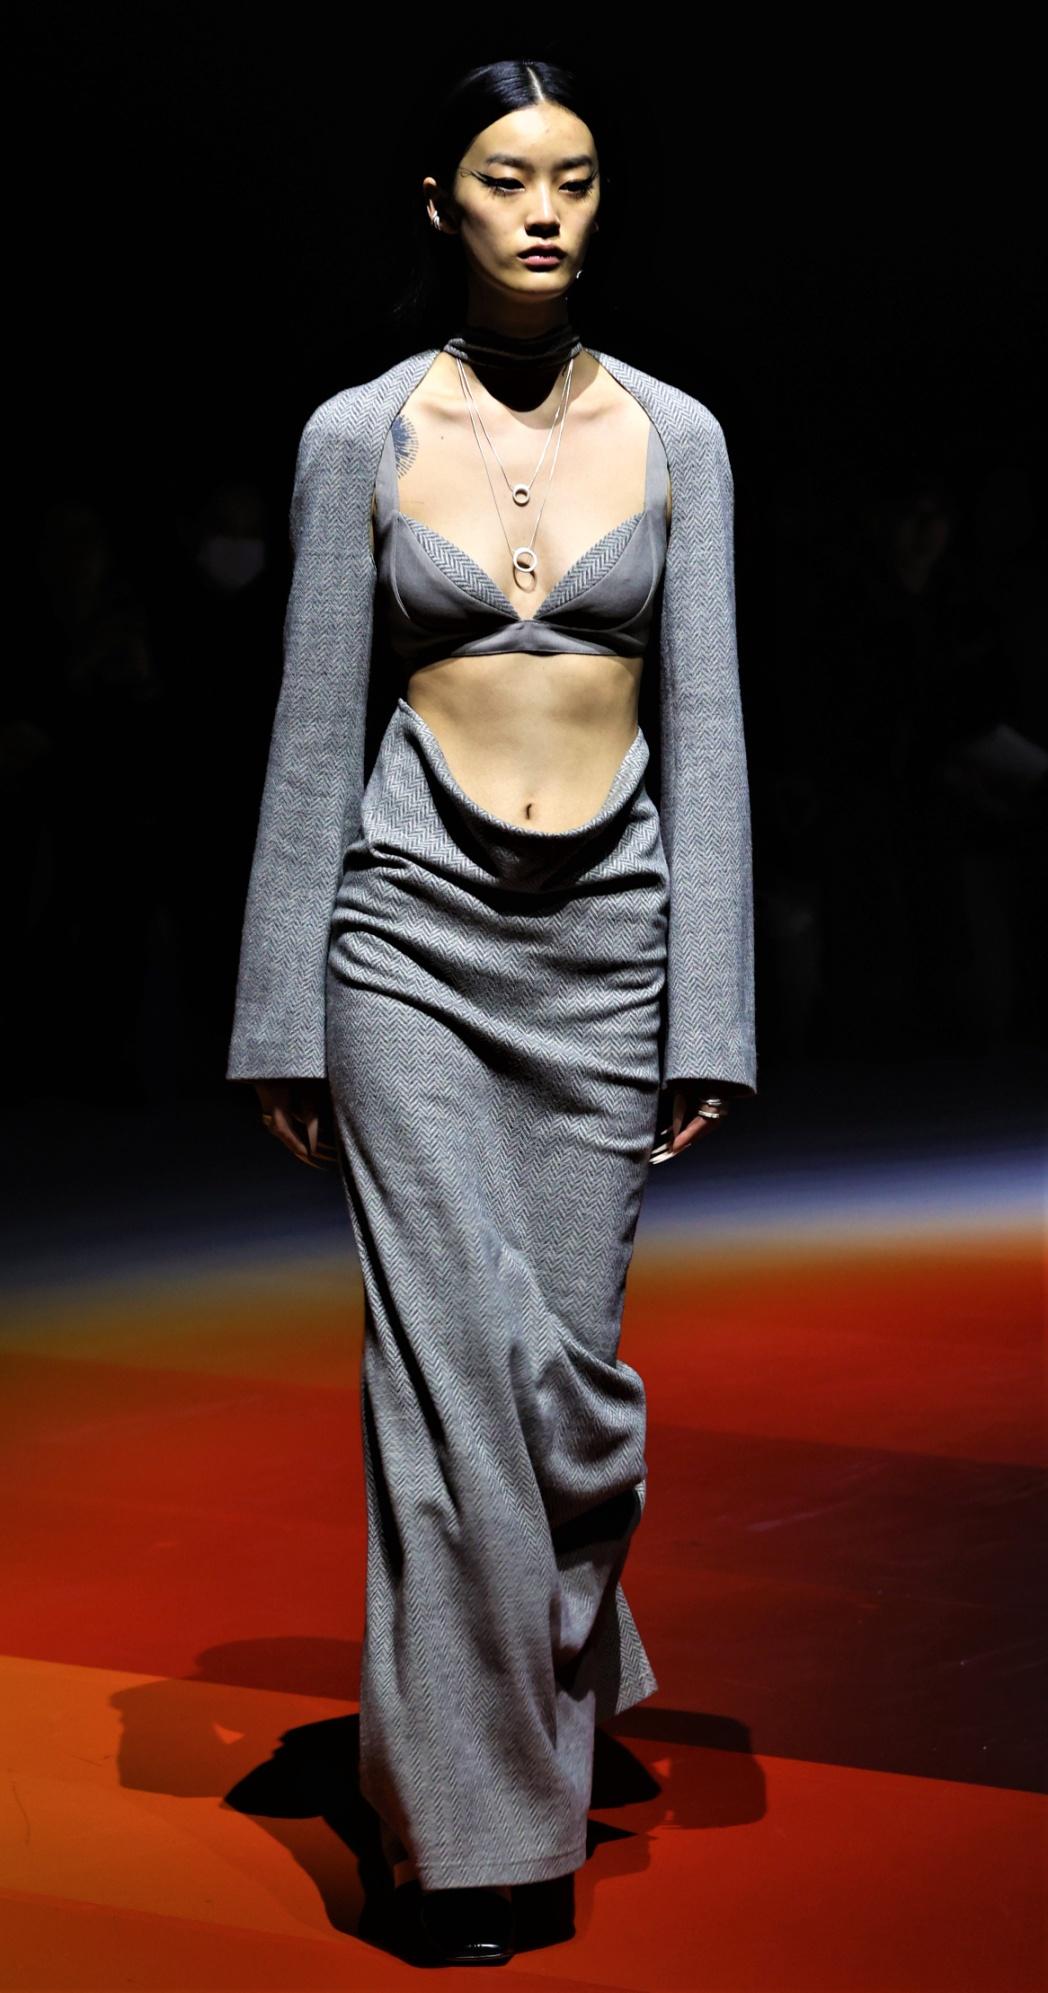 Oude Waag grey dress 2 pc Shanghai cropped use.jpg